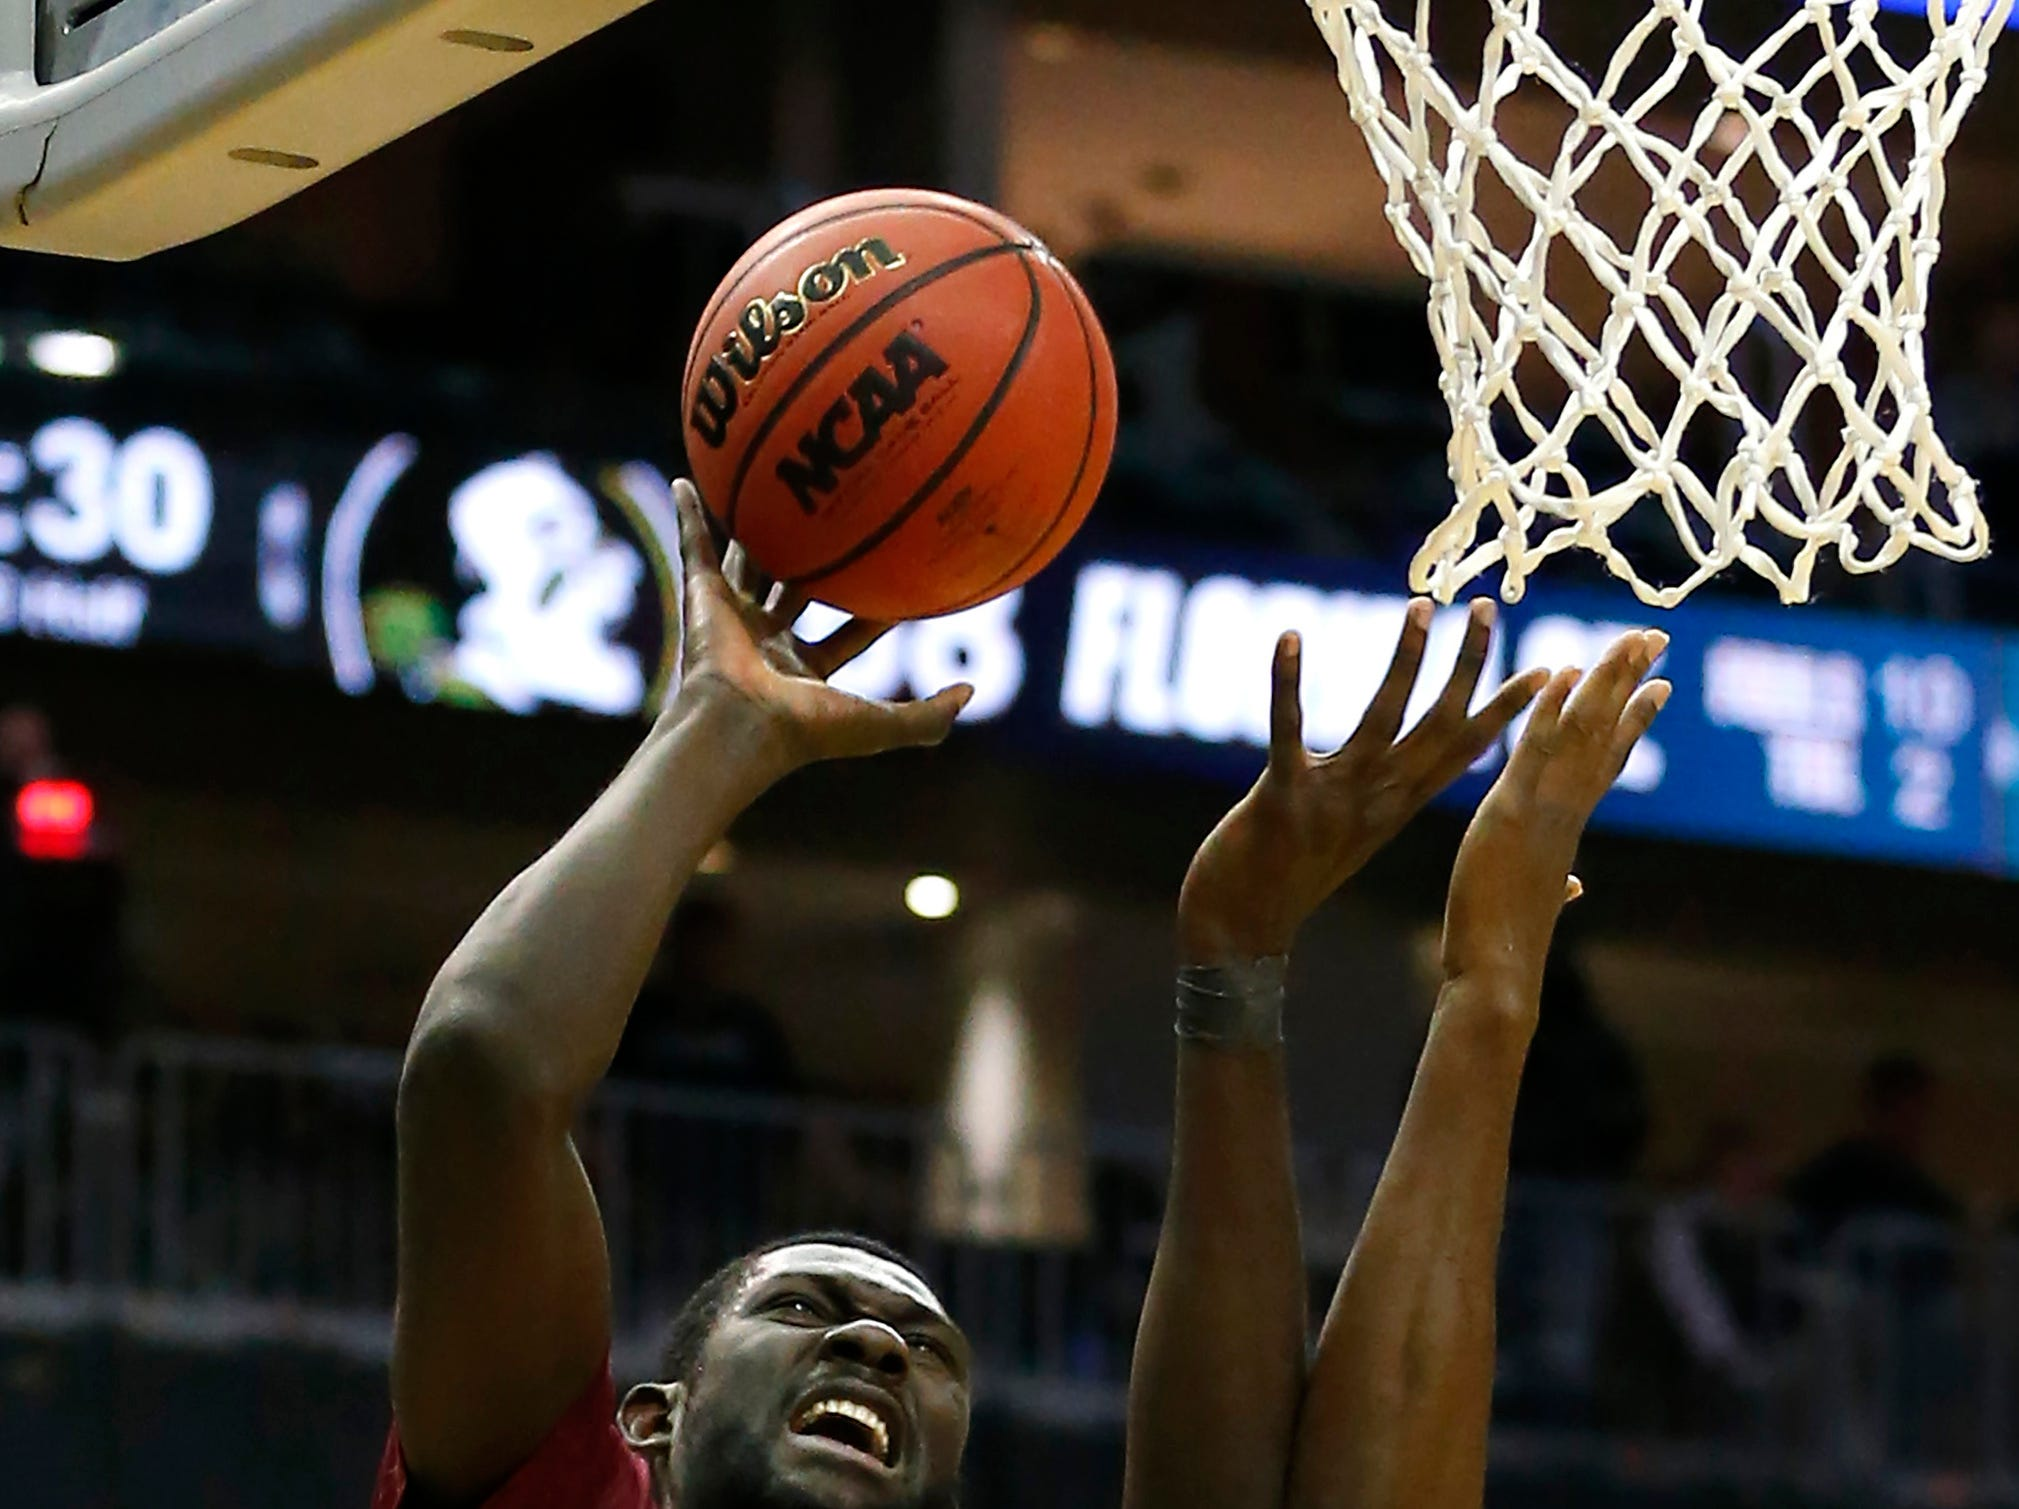 Dec 8, 2018; Newark, NJ, USA; Florida State Seminoles center Christ Koumadje (21) shoots the ball as Connecticut Huskies forward Kassoum Yakwe (14) defends during the second half at Prudential Center. Mandatory Credit: Noah K. Murray-USA TODAY Sports